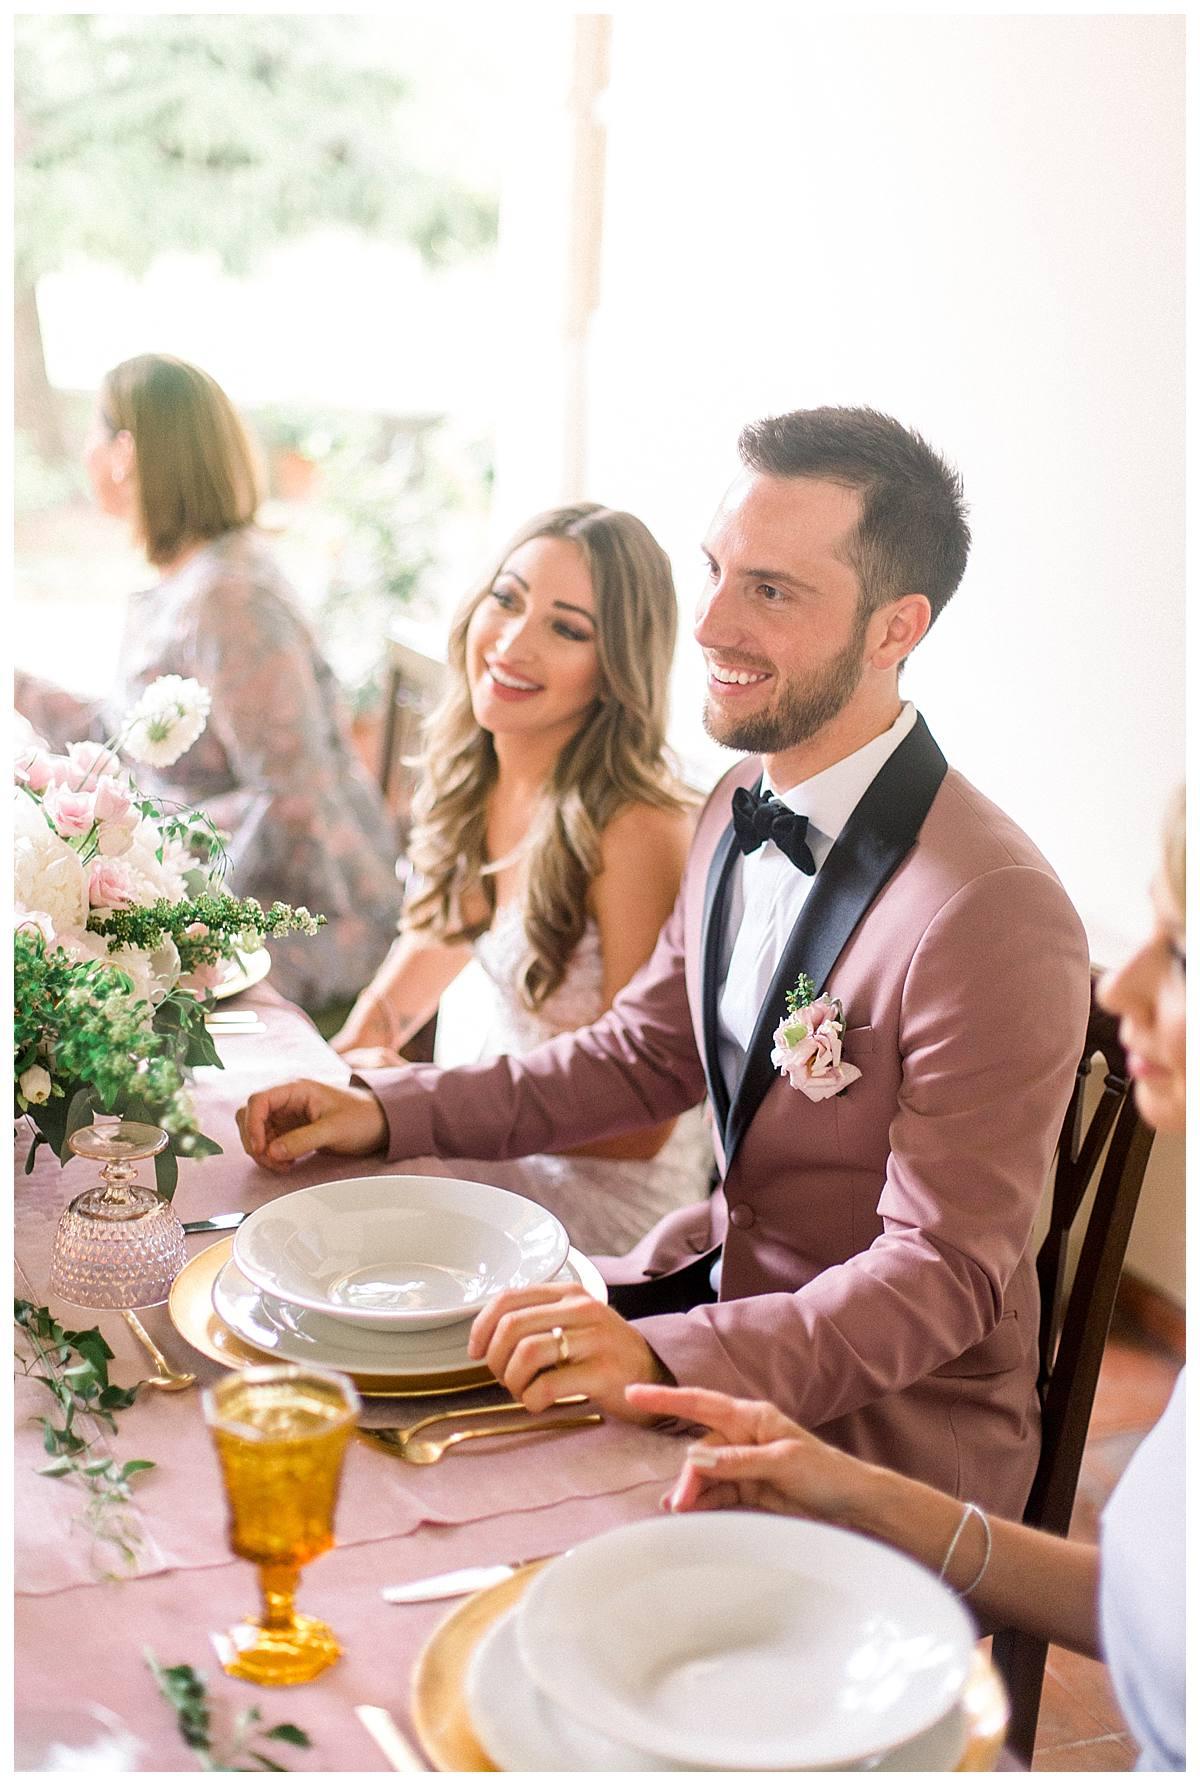 Ph @ The Fashion Wedding